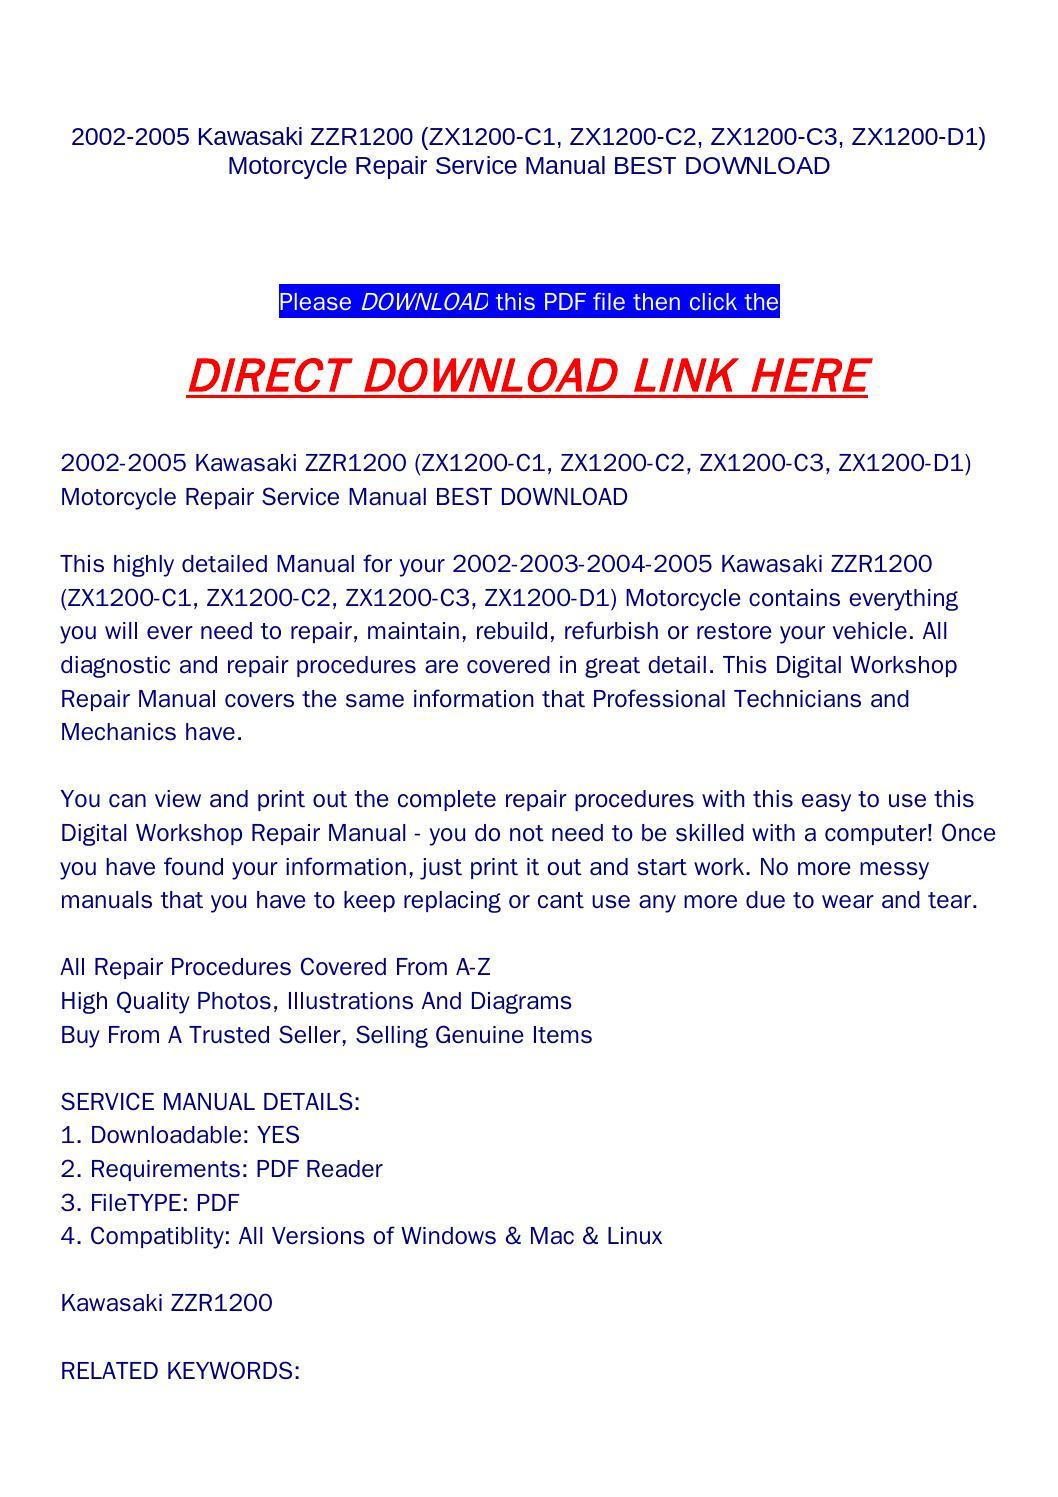 2002 2005 kawasaki zzr1200  zx1200 c1  zx1200 c2  zx1200 c3  zx1200 d1  motorcycle repair ZZR1200 Accessories ZZR1200 Review